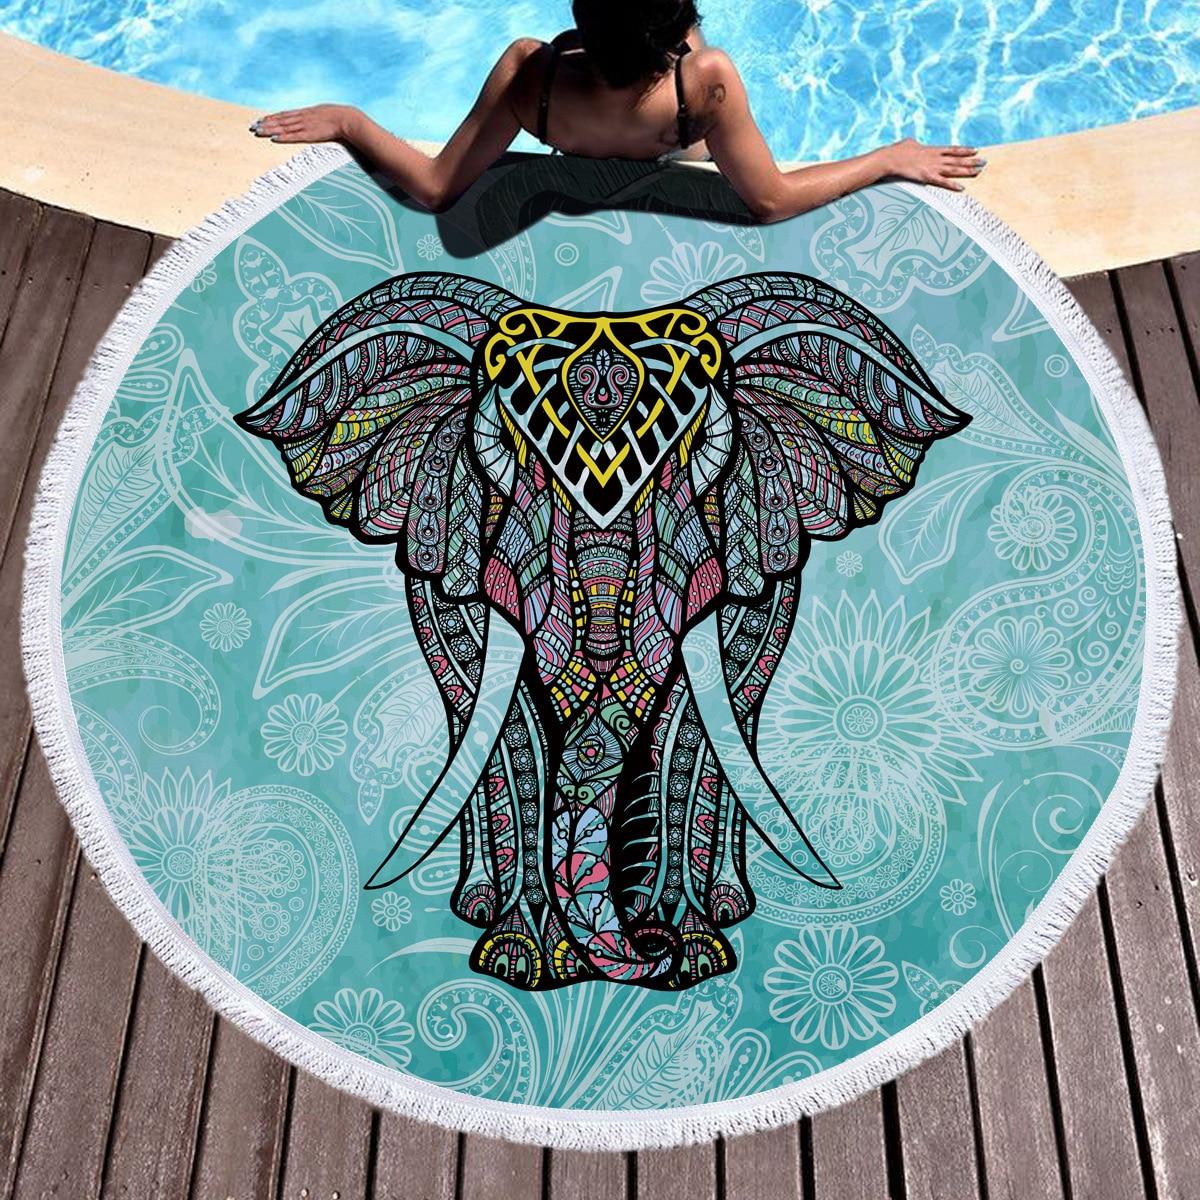 150cm <font><b>Bohemian</b></font> <font><b>Indian</b></font> Mandala Beach Throw Large Round Elephant Beach Towel Picnic Blanket Mat Pool <font><b>Tapestry</b></font> Decoration Yoga Mat